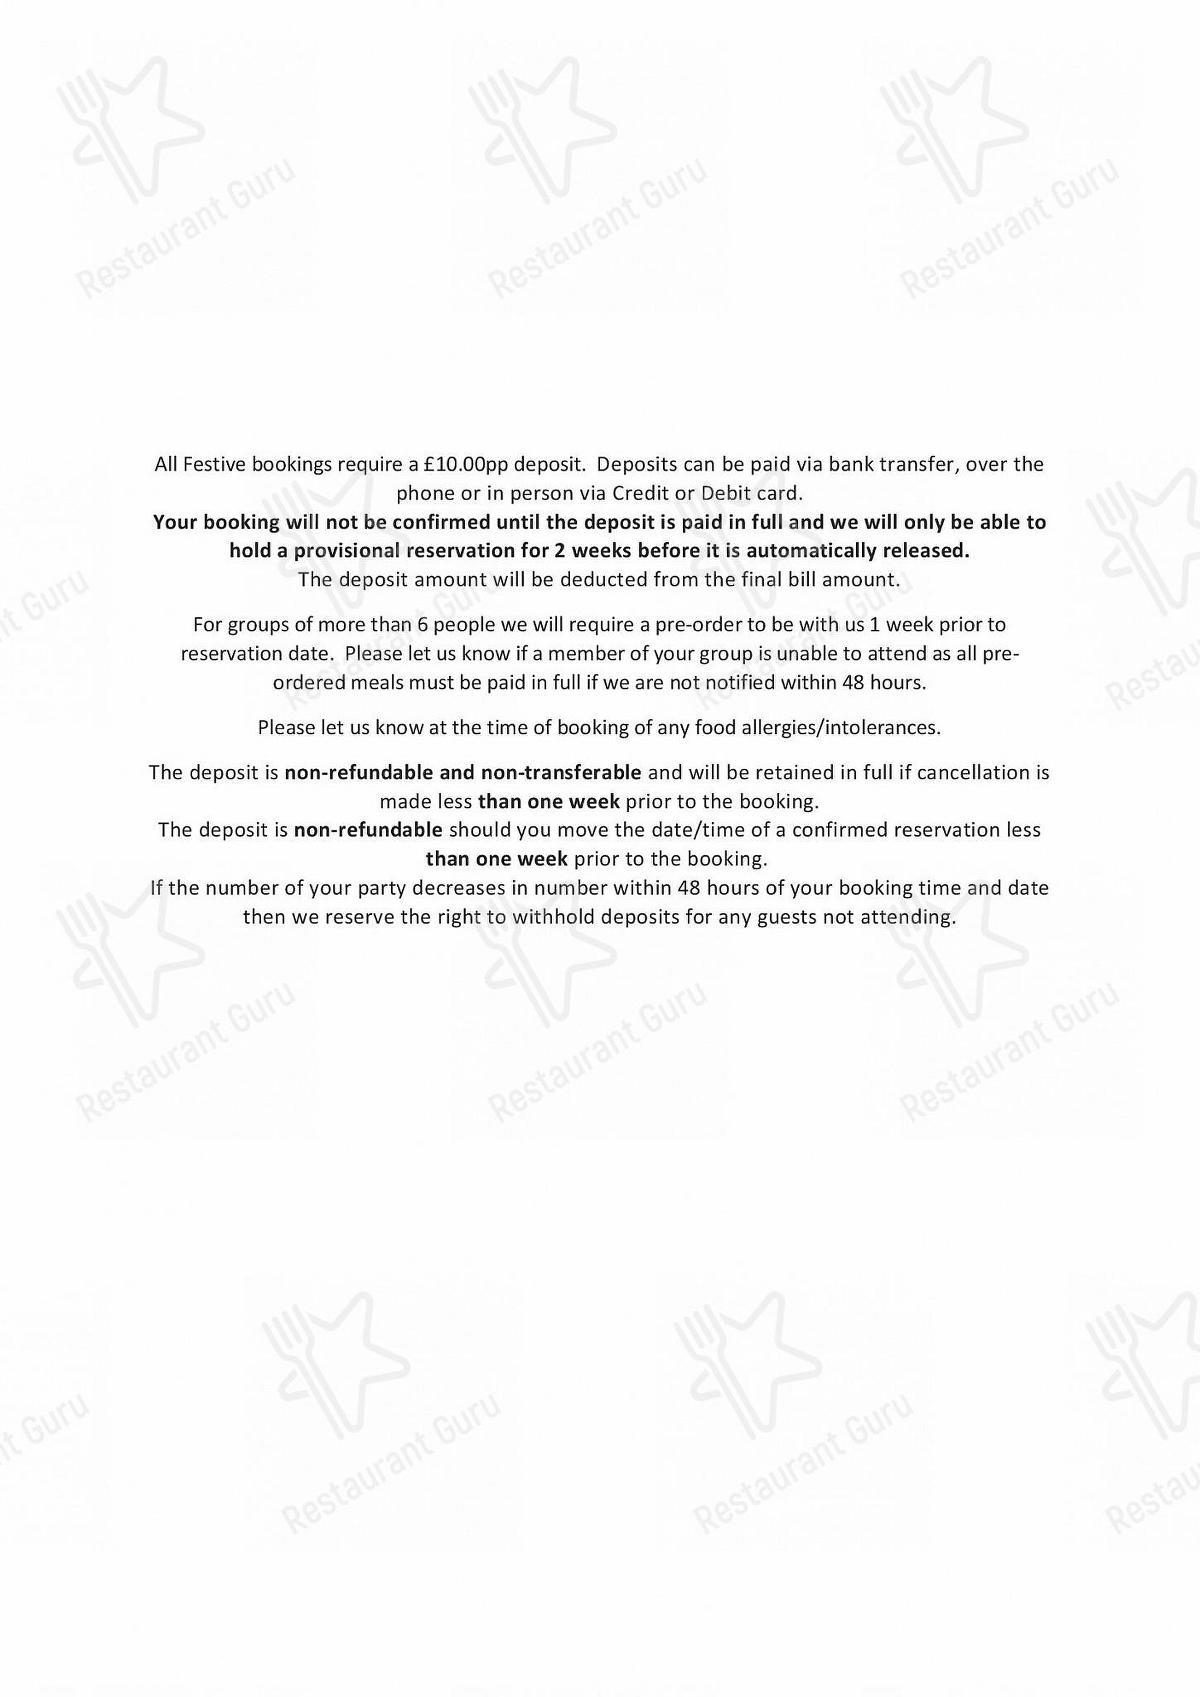 Penrose Kitchen menu - meals and drinks